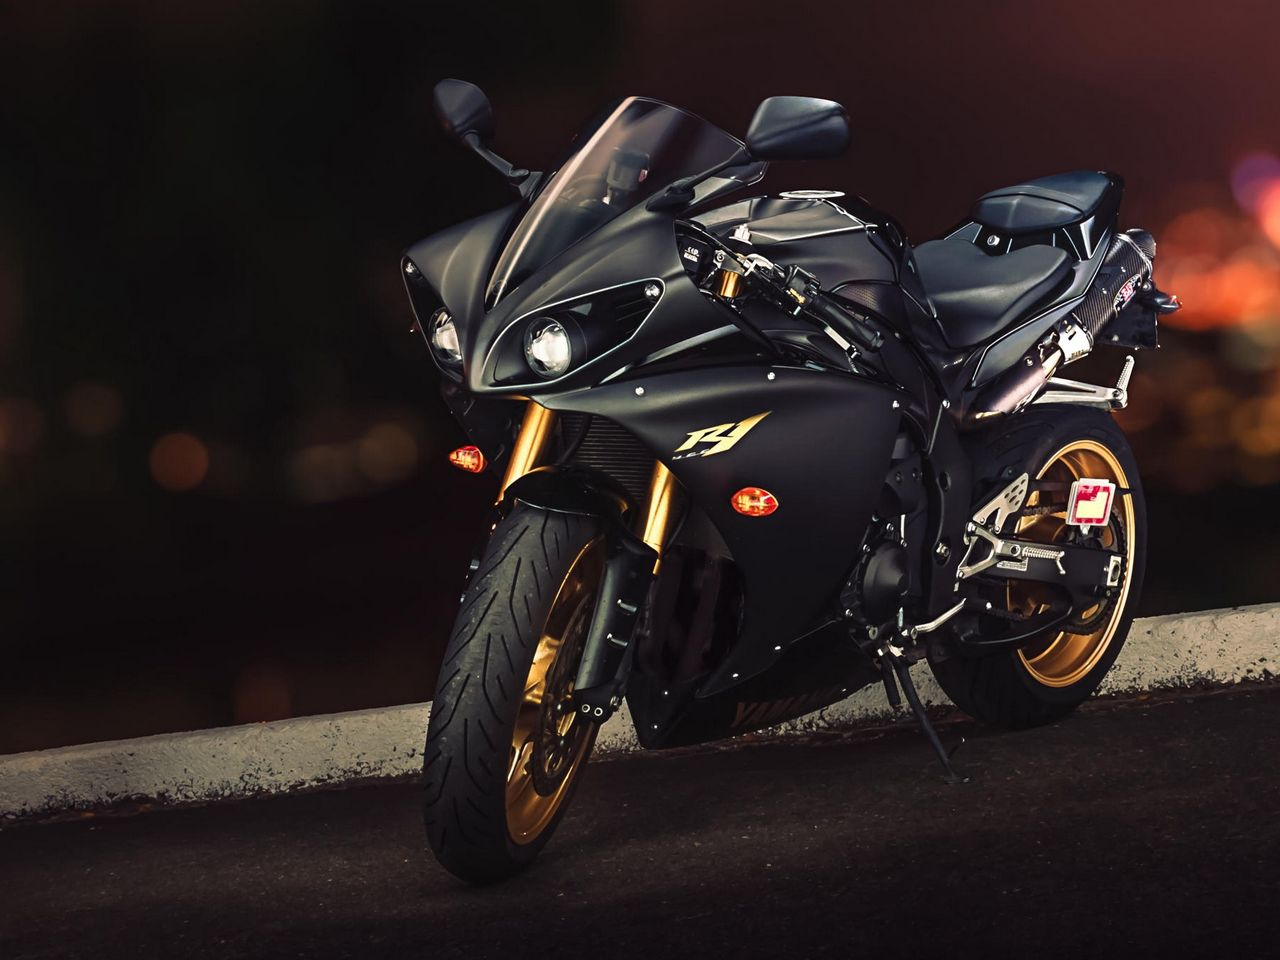 1280x960 Wallpaper yamaha, yzf-r1, sport bike